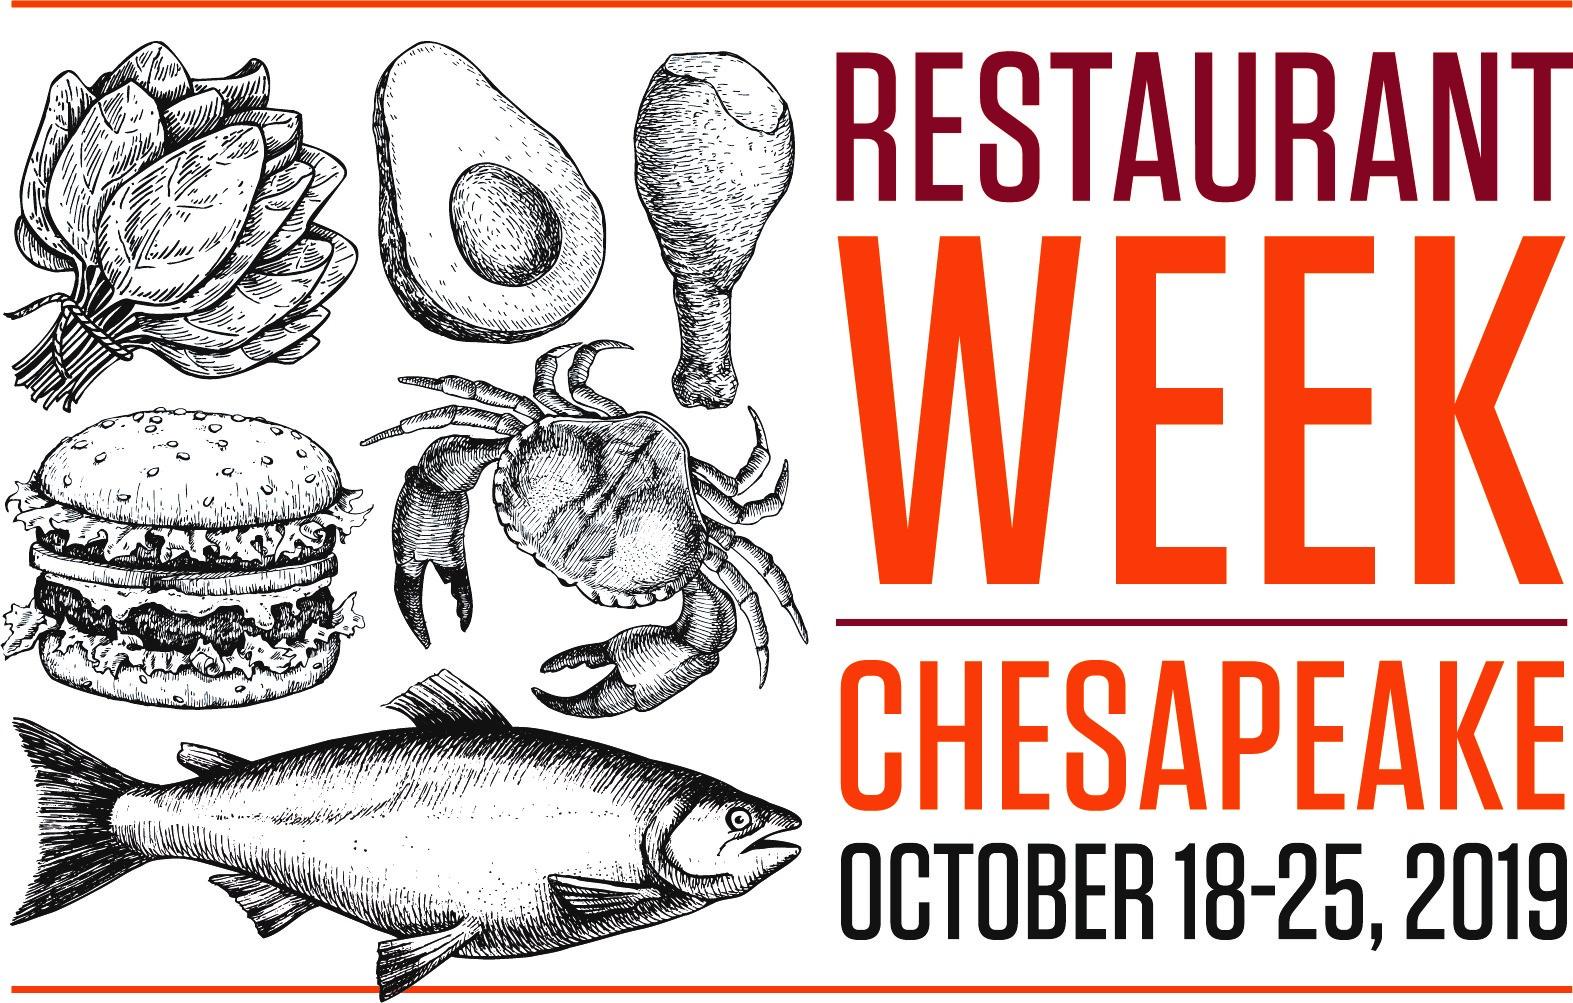 Chesapeake Restaurant Week 2019